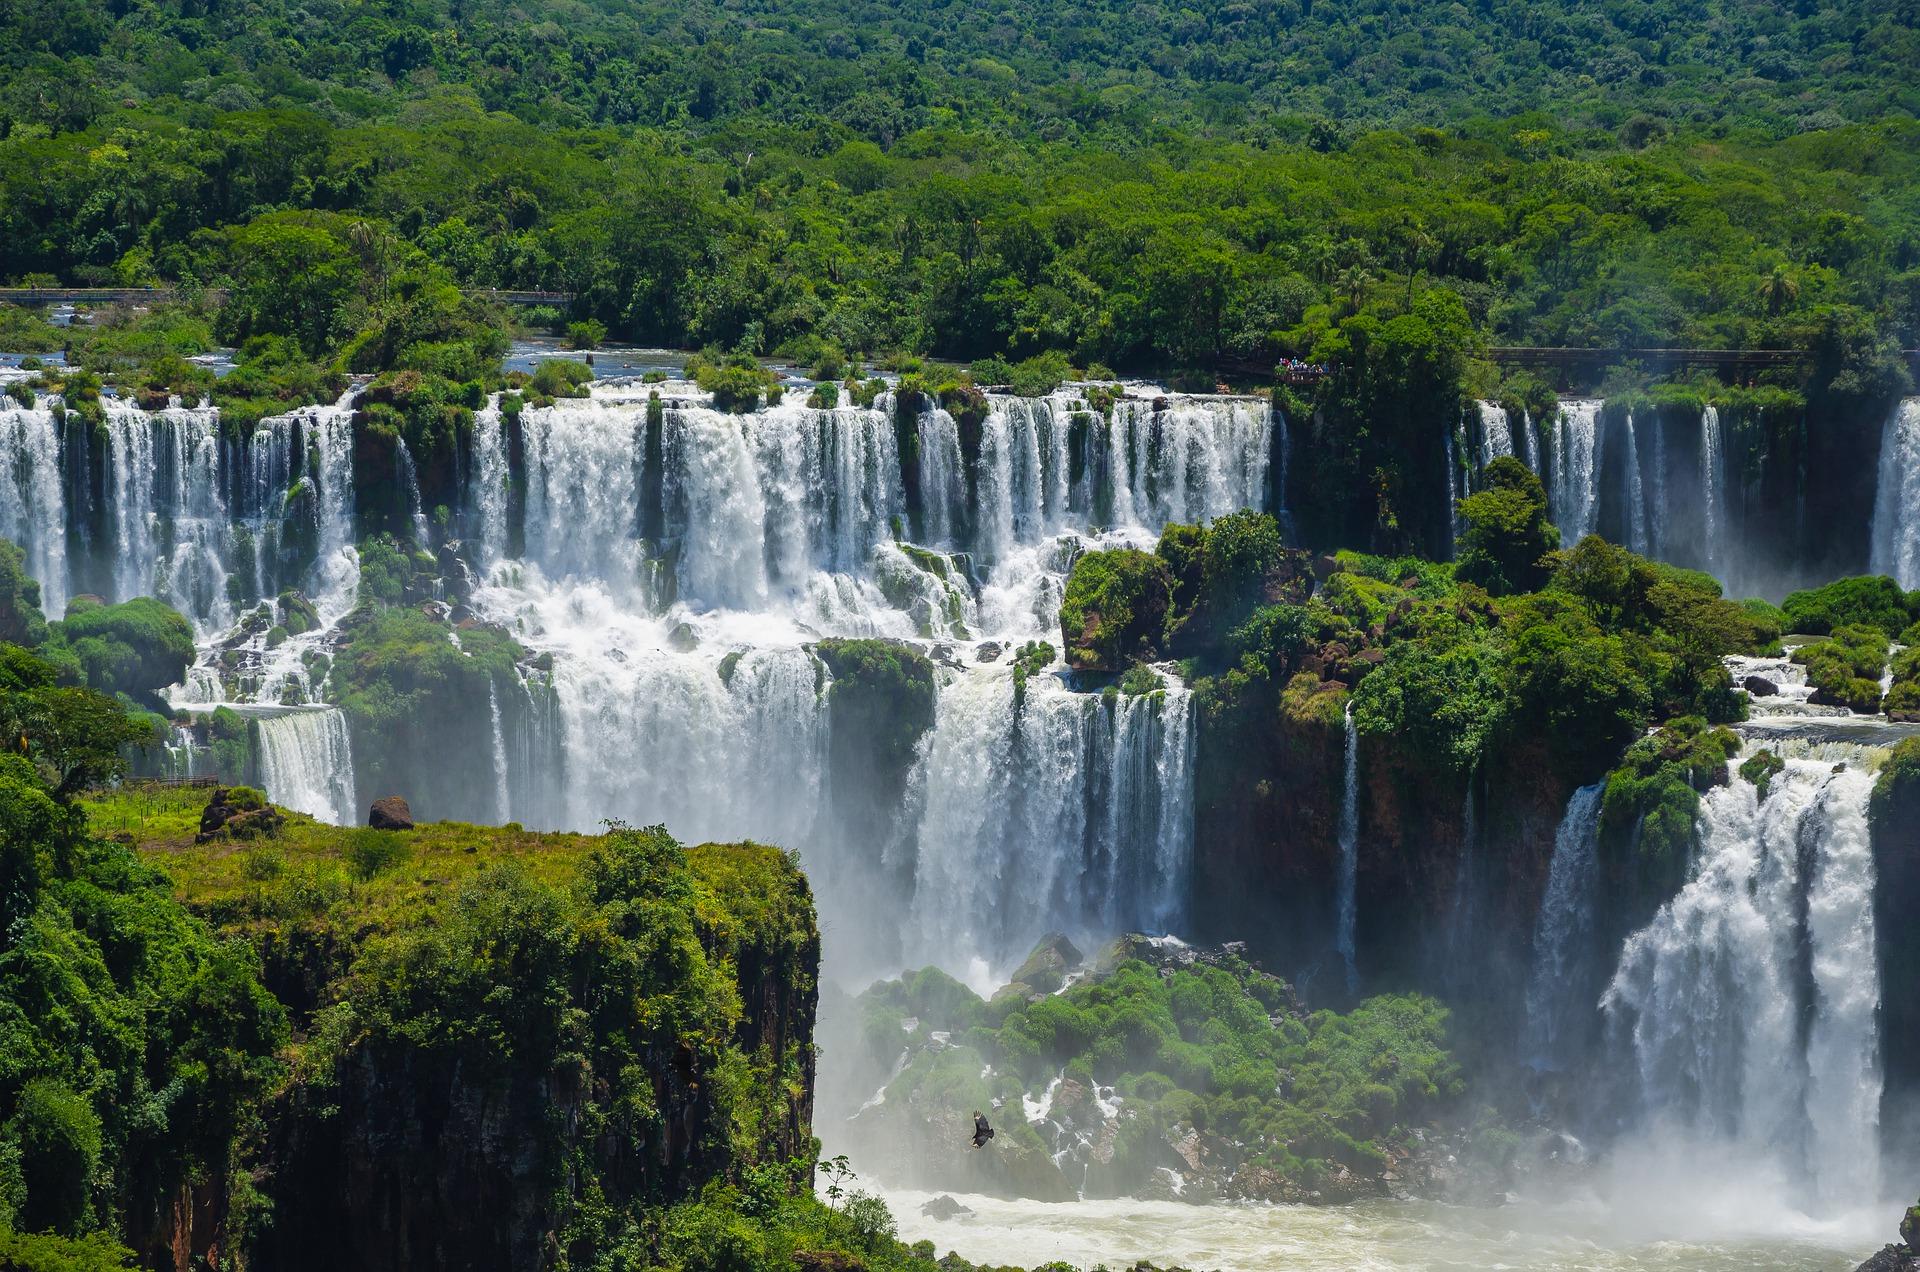 A Land of Wine, Culture & Falls | Iguazu Falls, Argentina